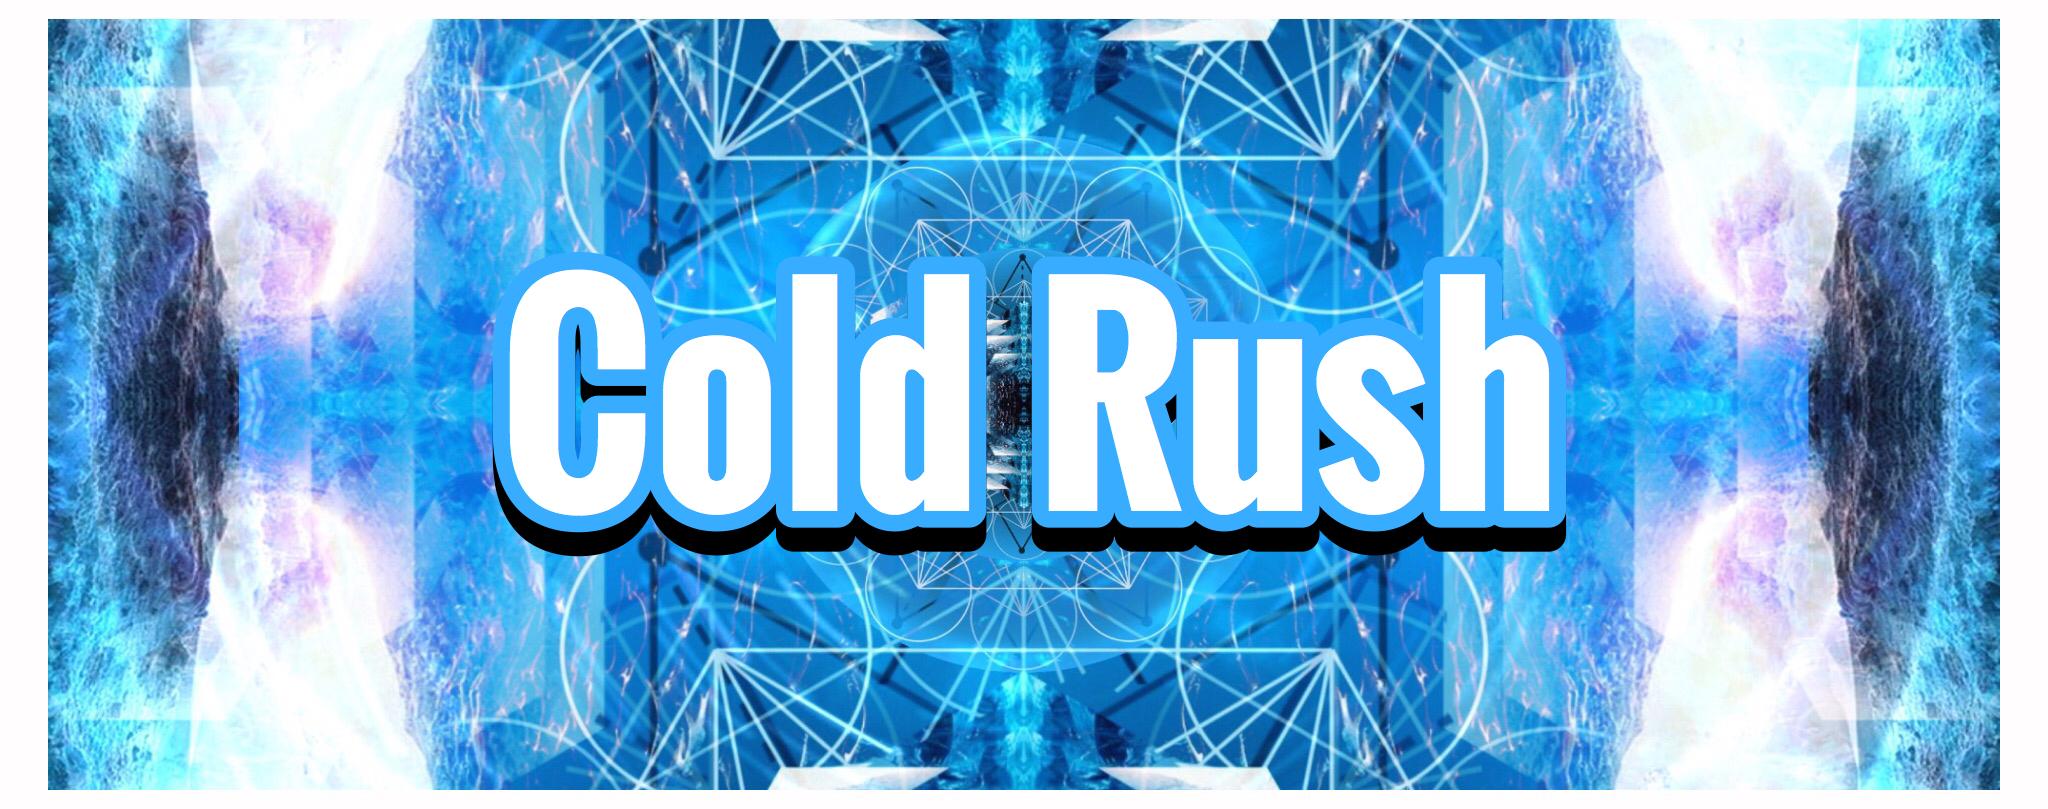 cold-rush-thumbnail.JPG